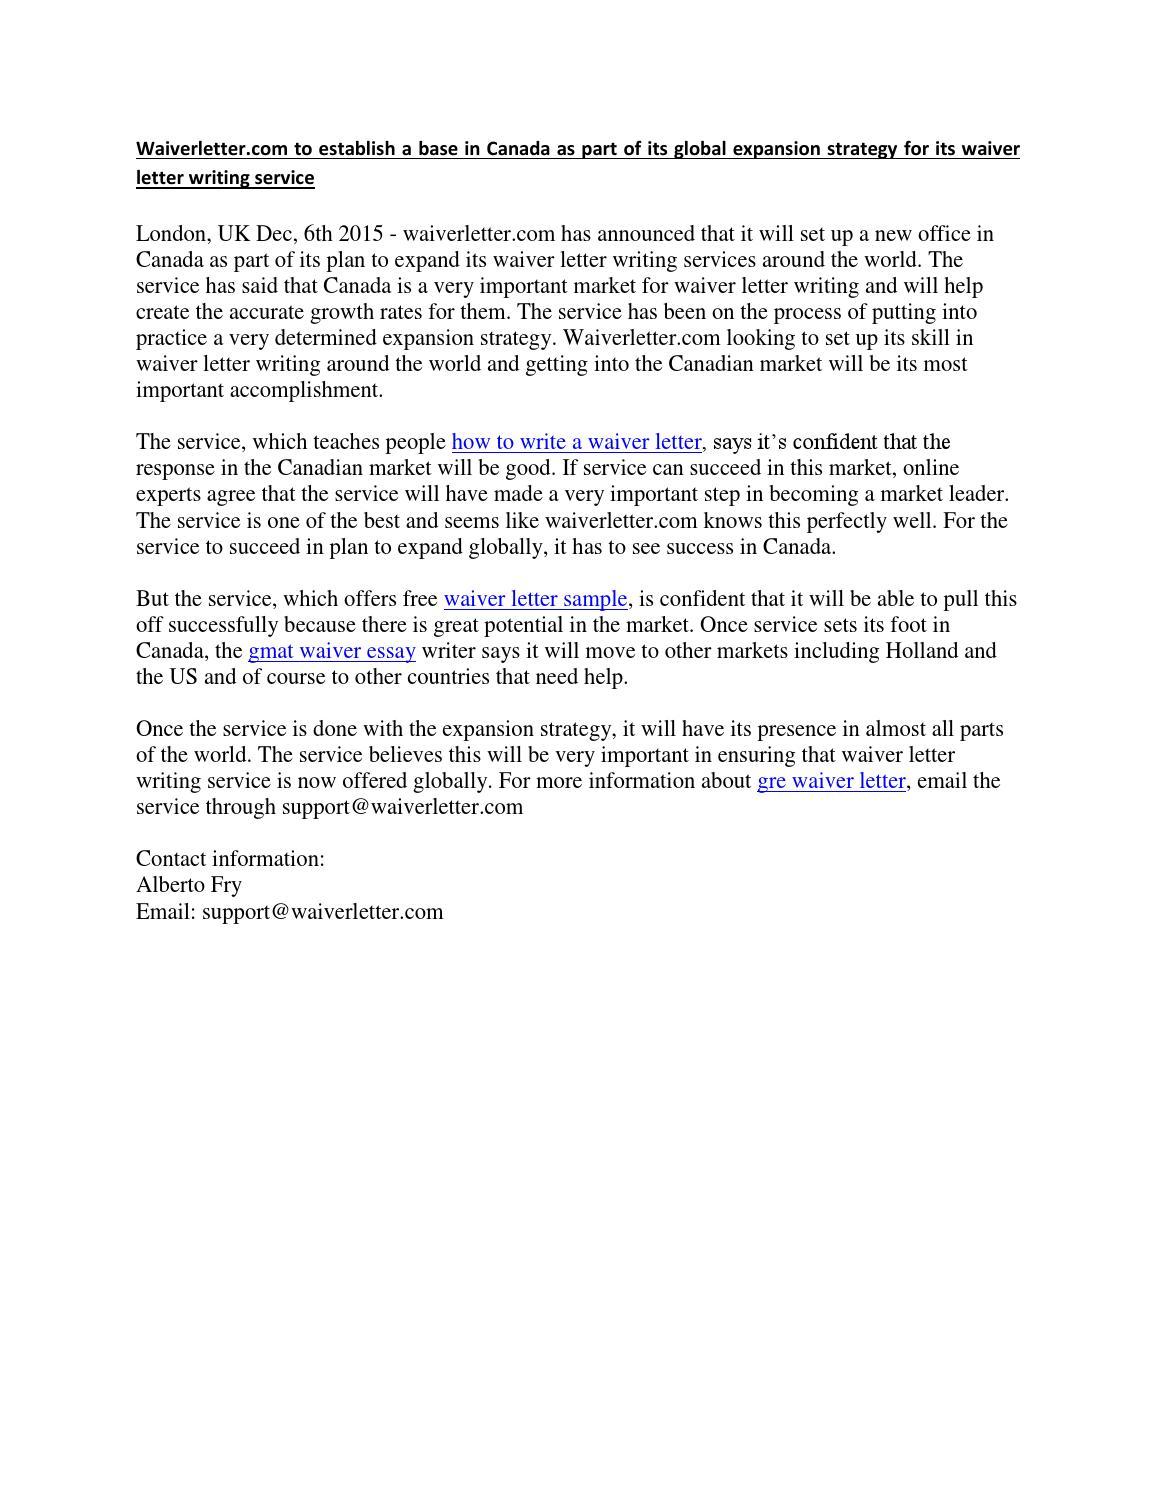 gmat waiver essay sample